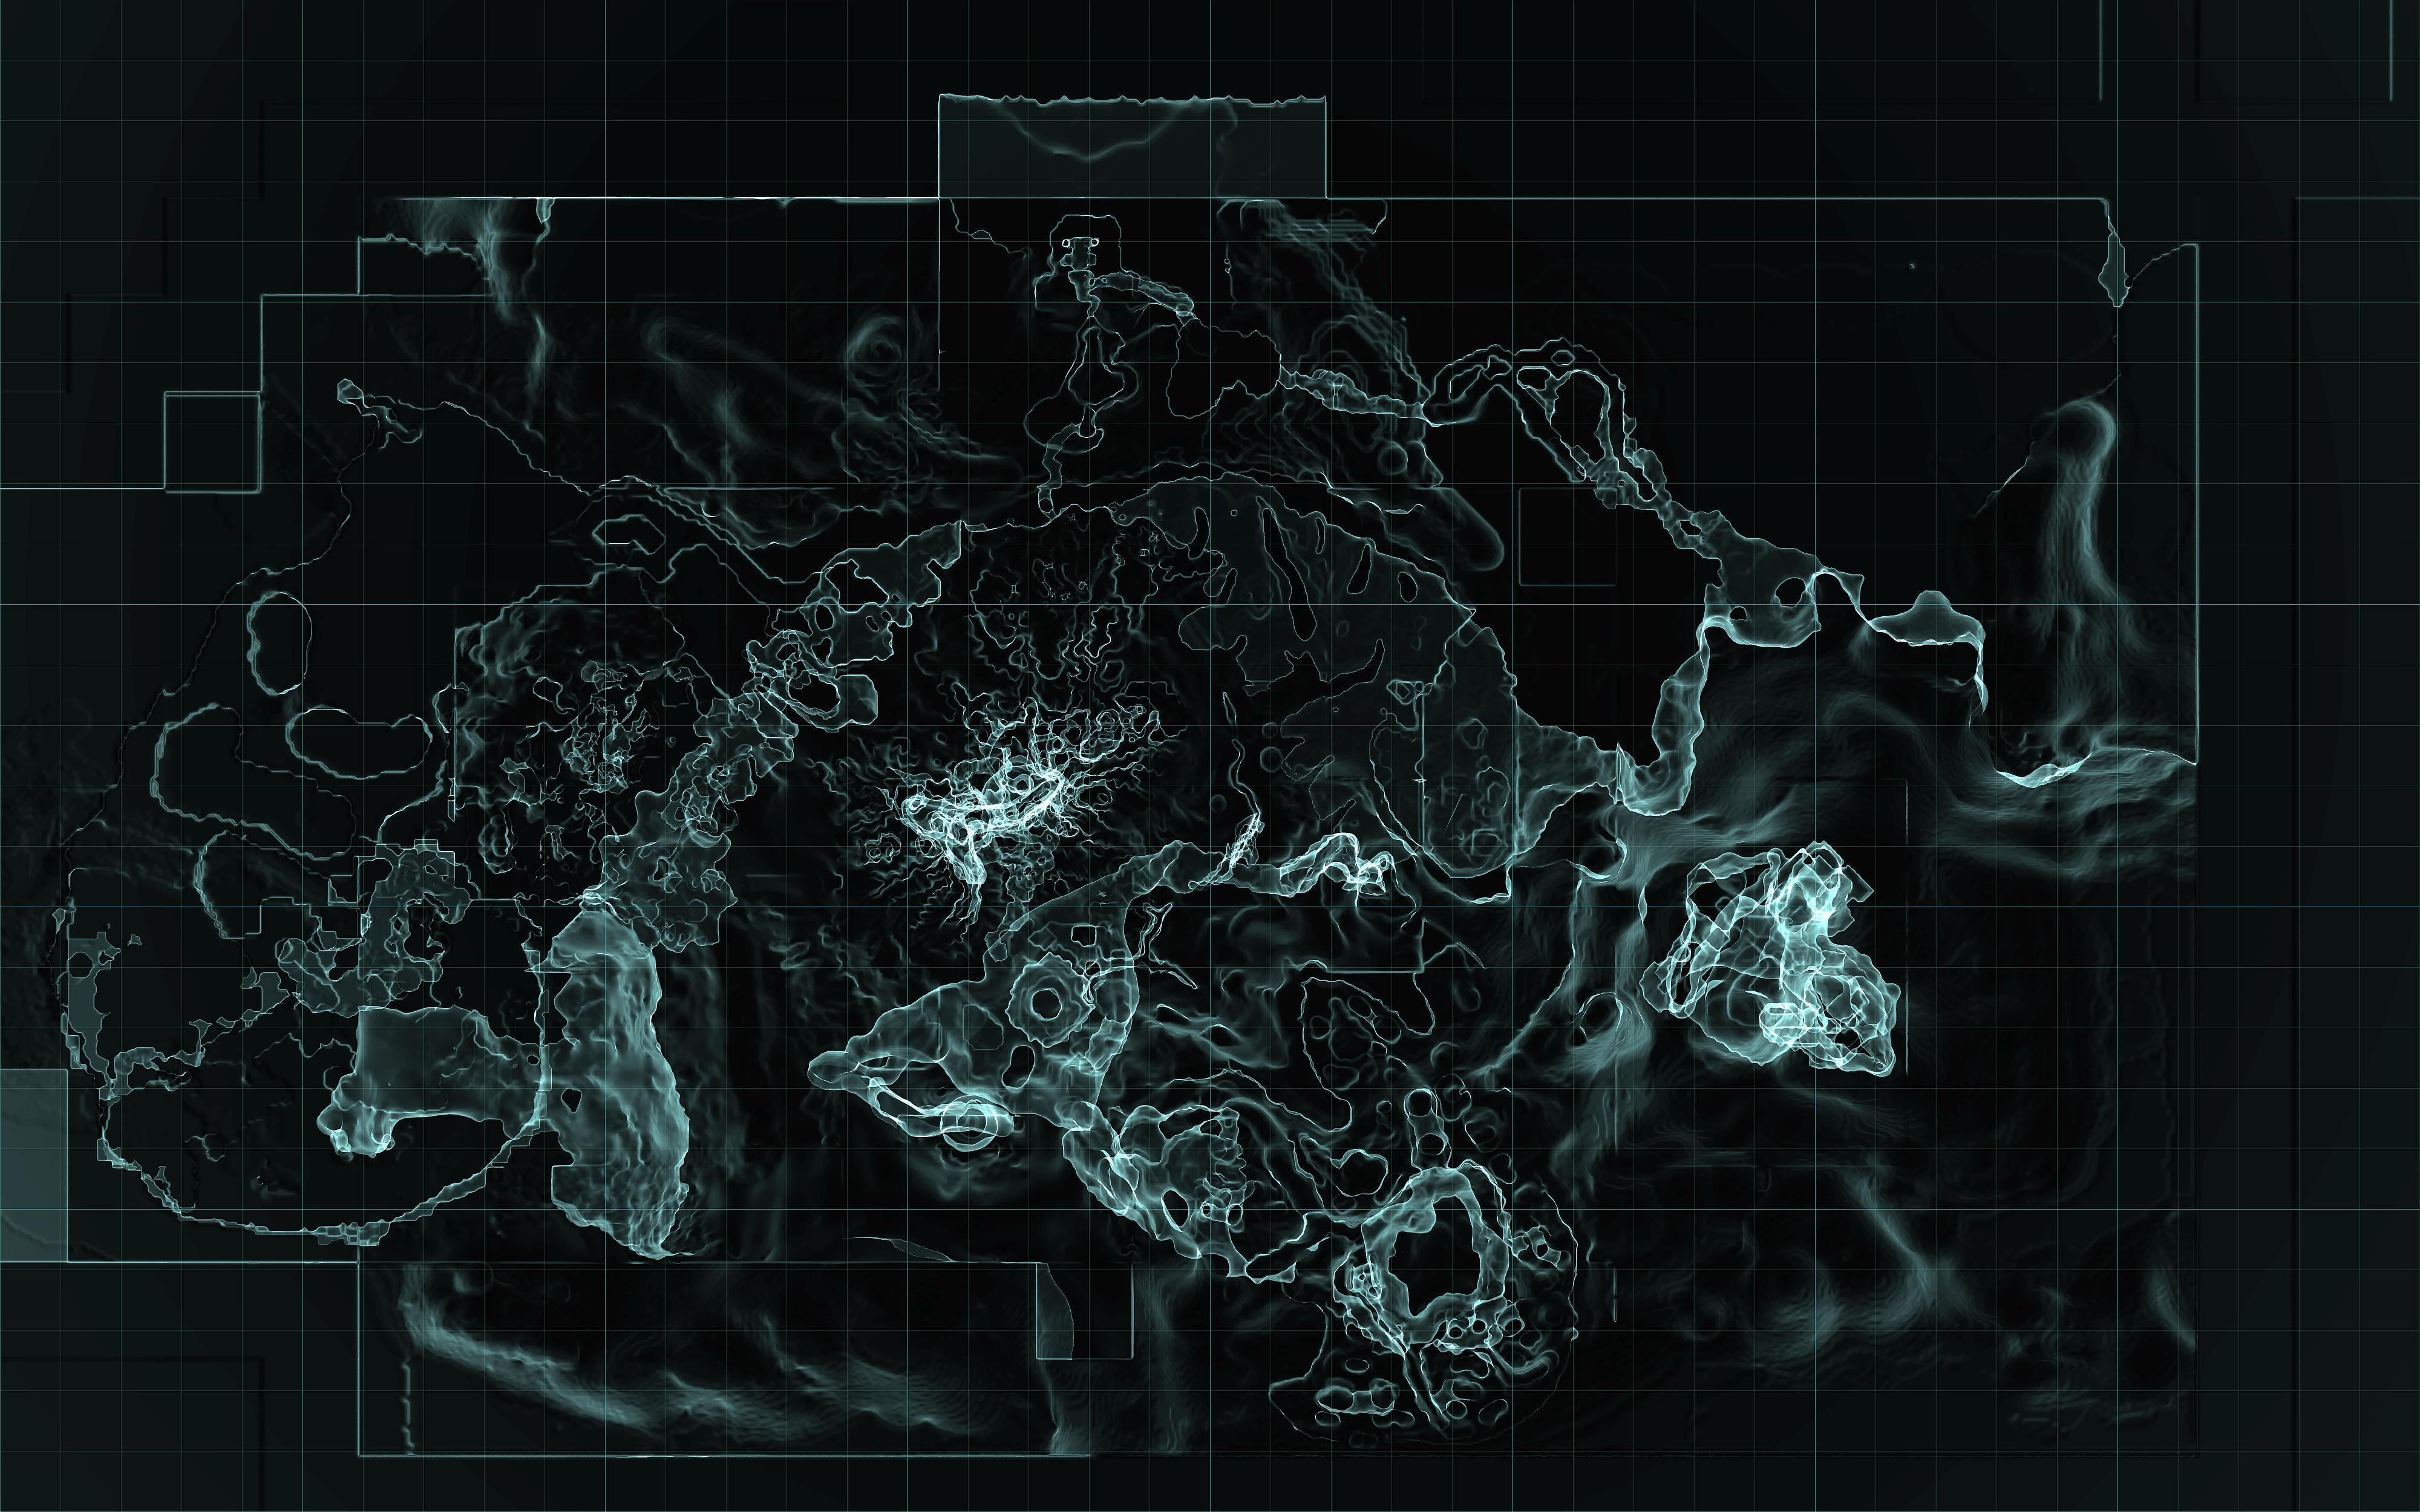 Subnautica Karte.Subnautica Below Zero World Map